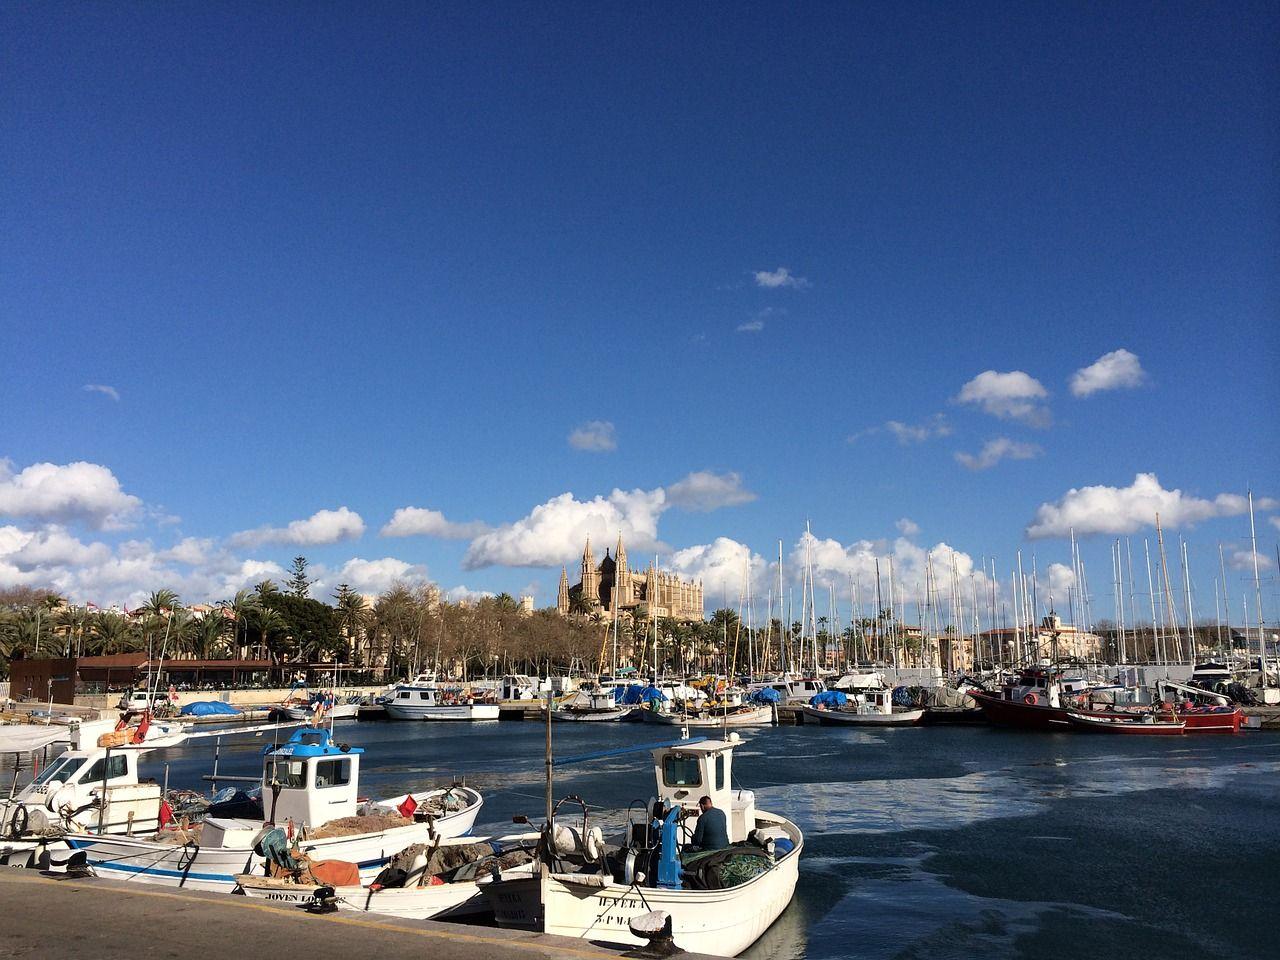 Conoce Palma De Mallorca Qué Hacer En Tres Días El Mapa Del Viajero Palma De Mallorca Mallorca Paseo En Barco